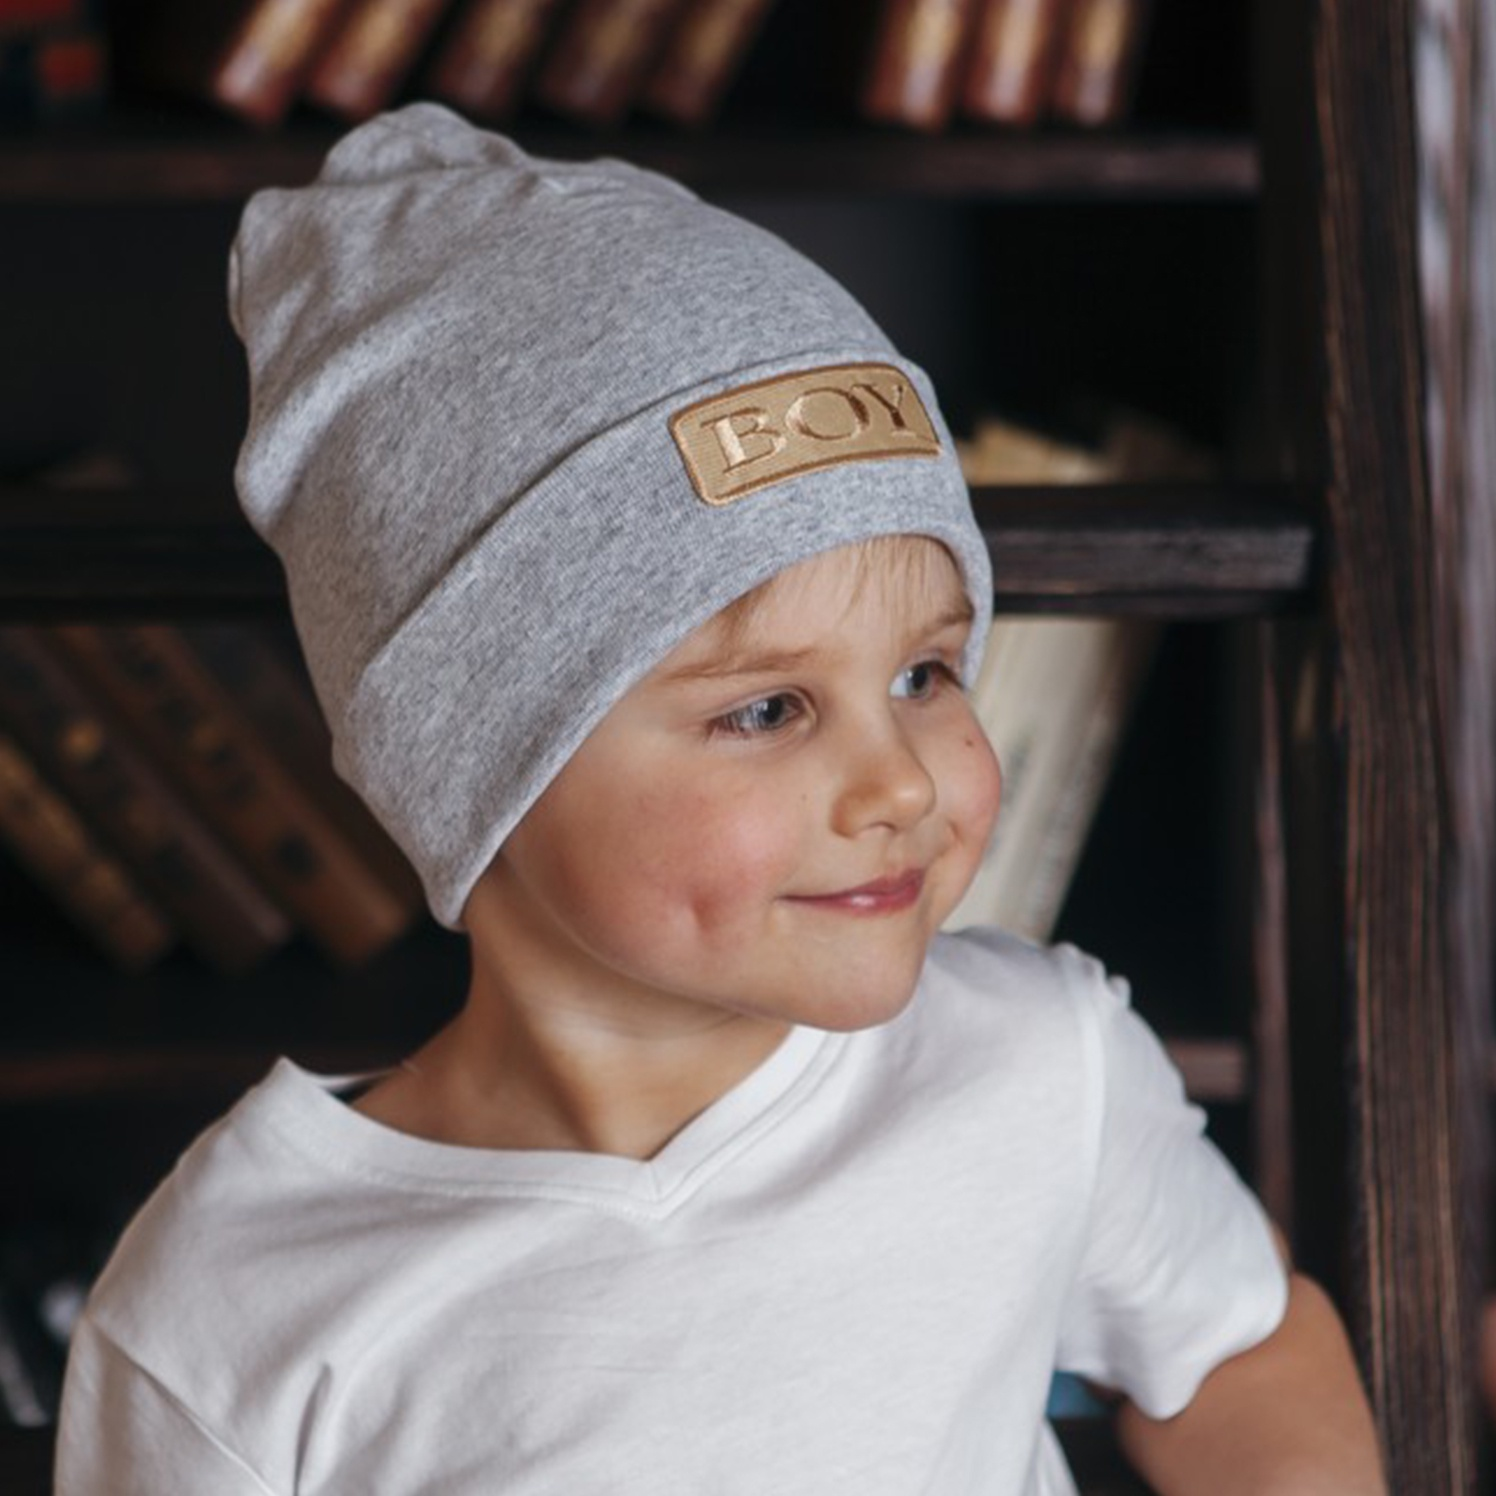 Шапка HOHLOON шапка женская r mountain цвет серый 77 030 05 размер универсальный